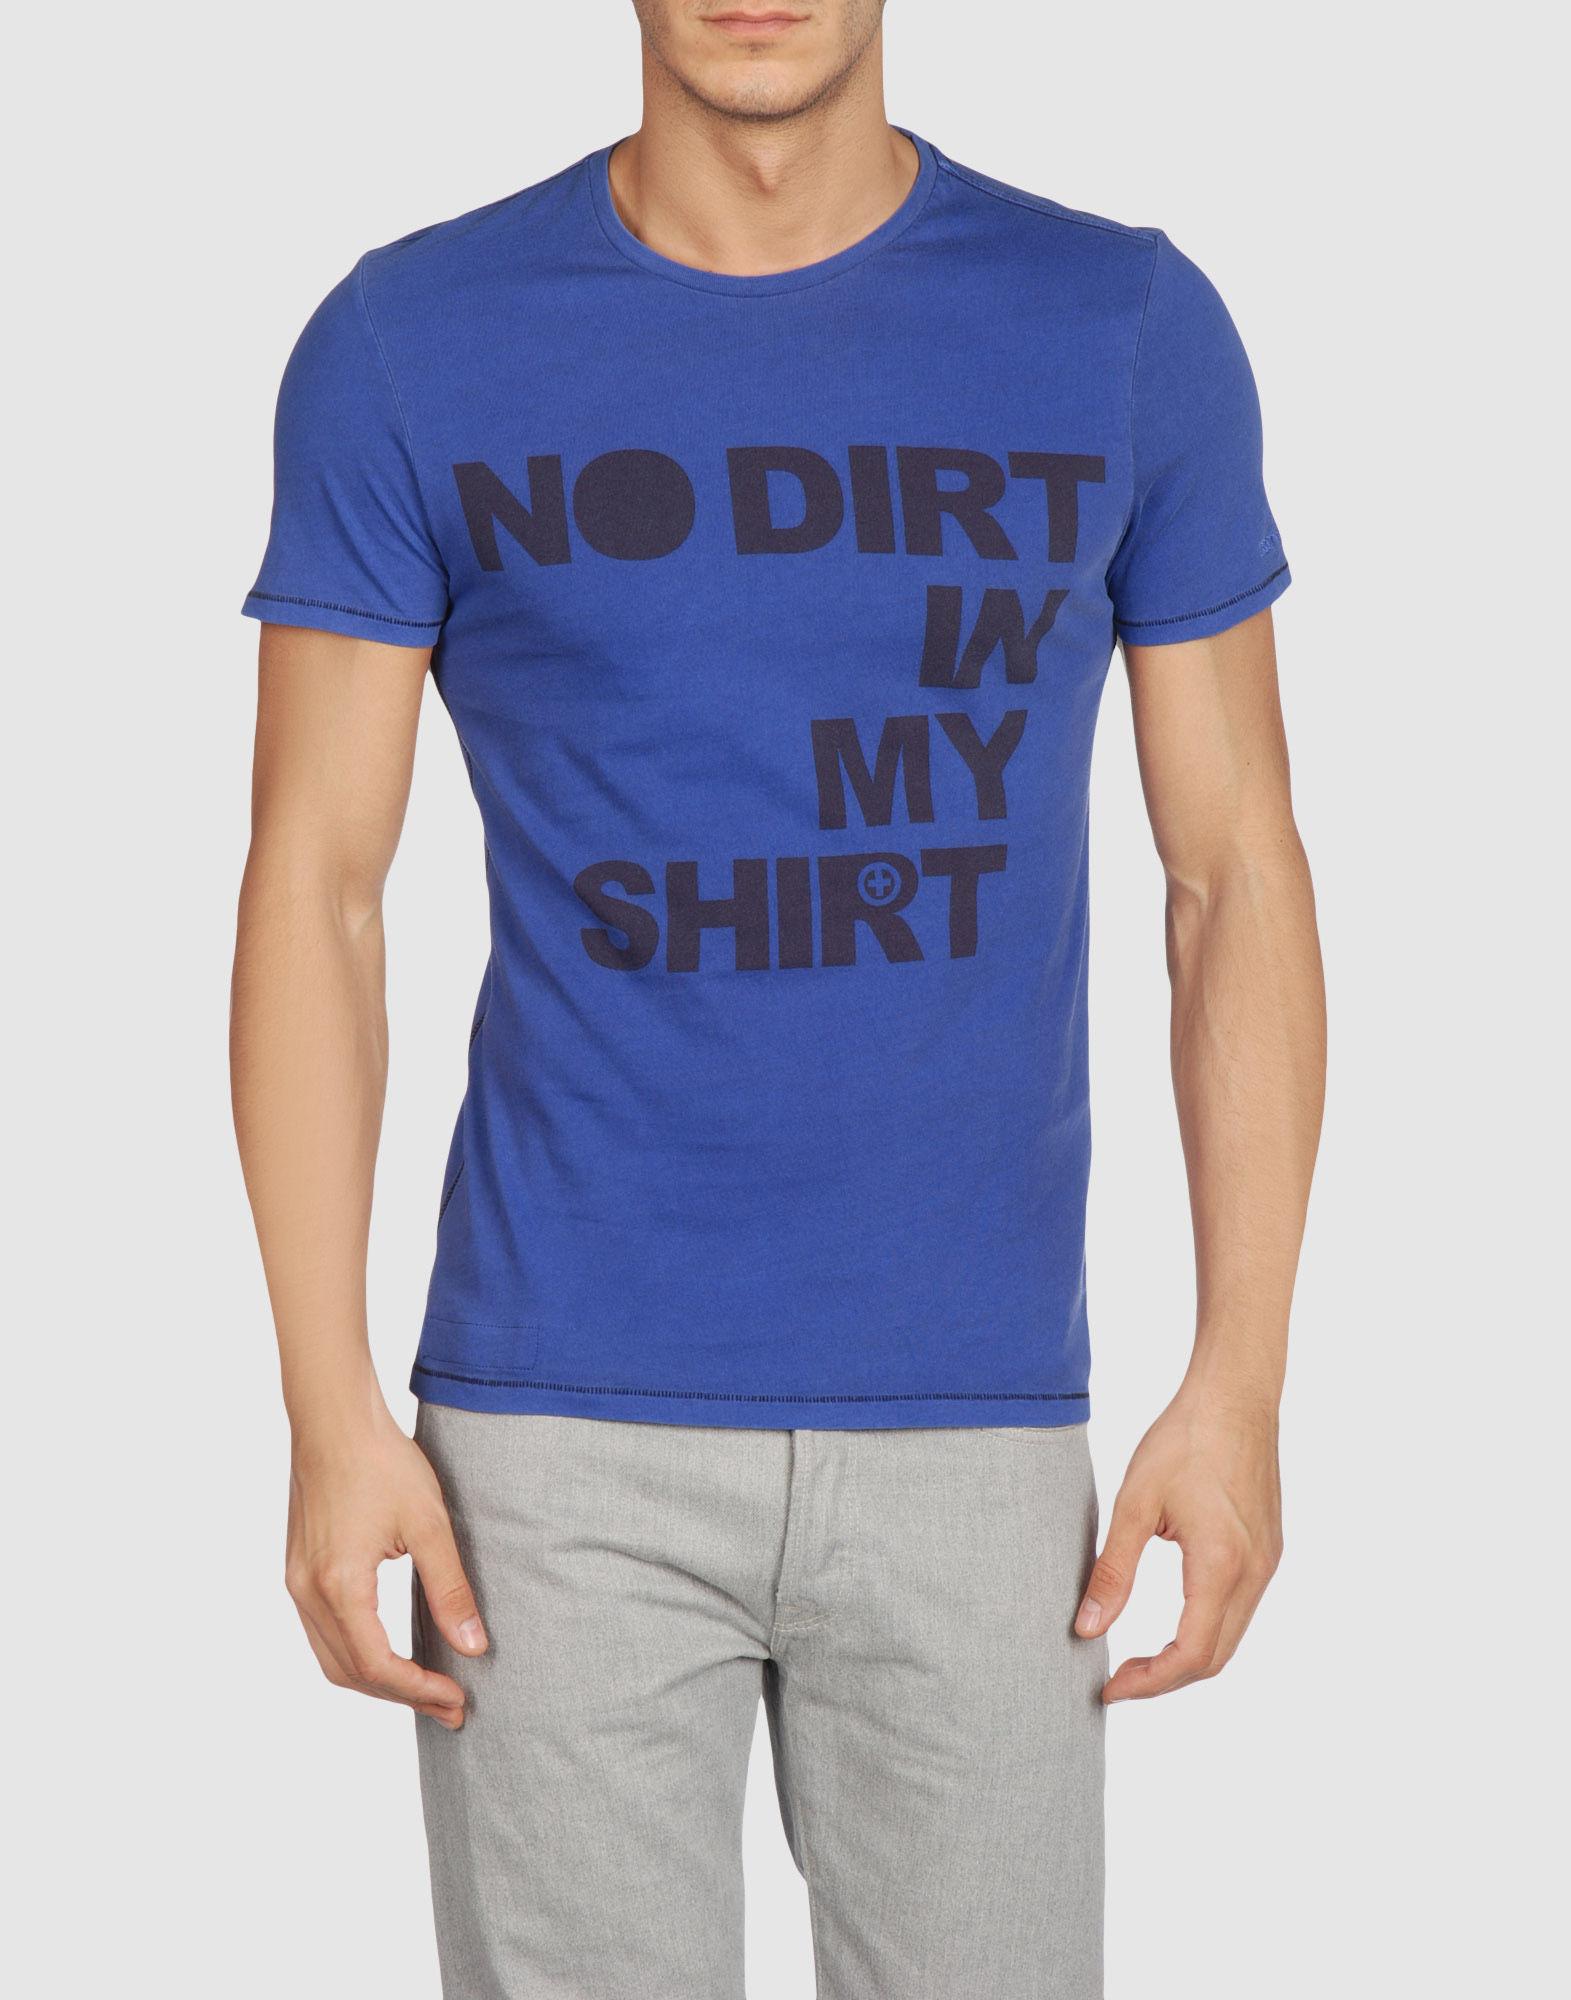 KUYICHI Футболка с короткими рукавами футболка nobarey футболка с короткими рукавами